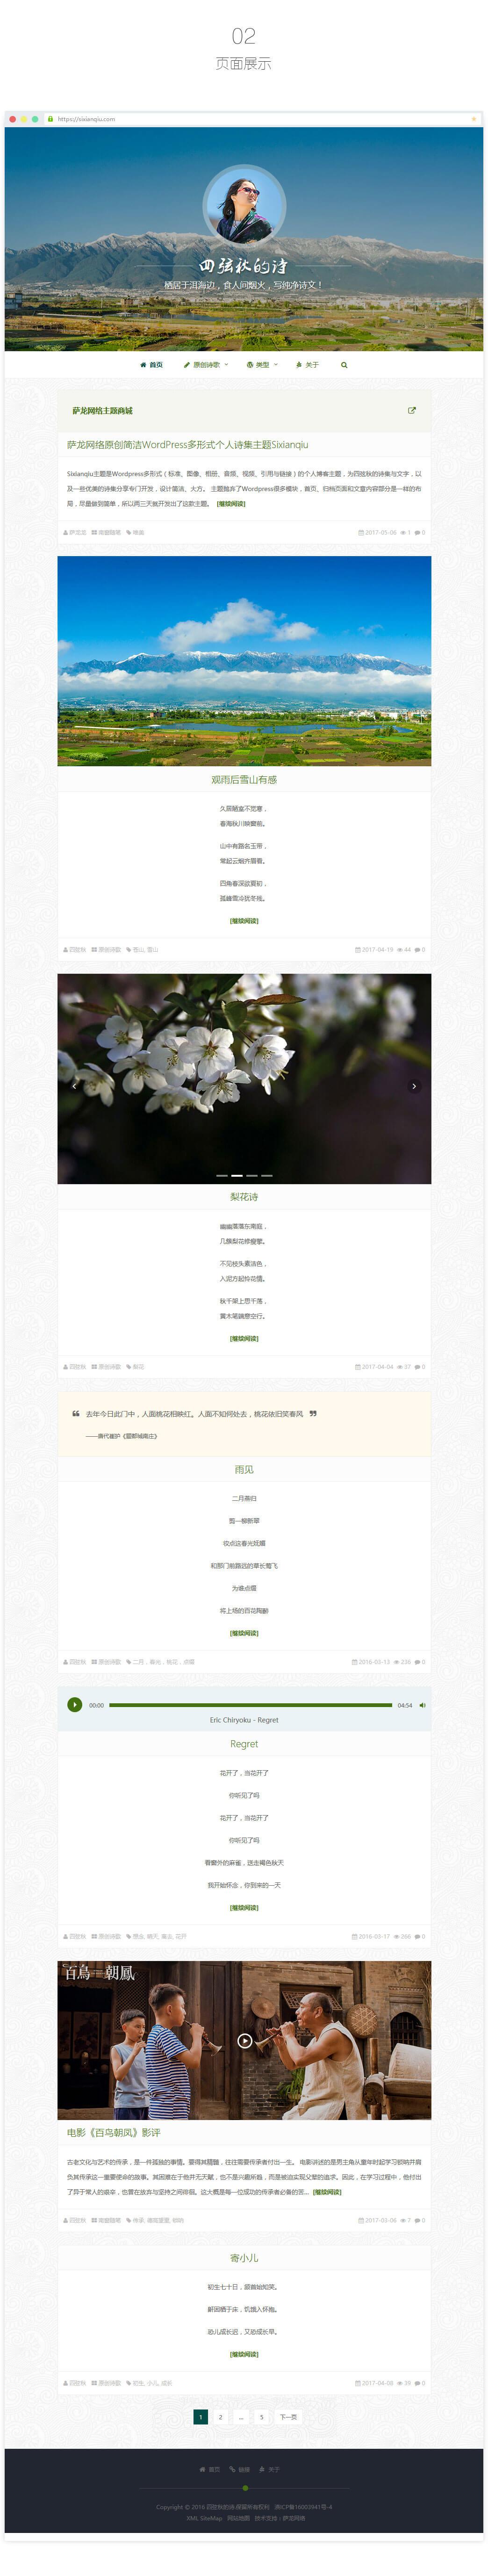 WordPress简约多形式博客主题 – Sixianqiu【转让】 WordPress主题 第2张